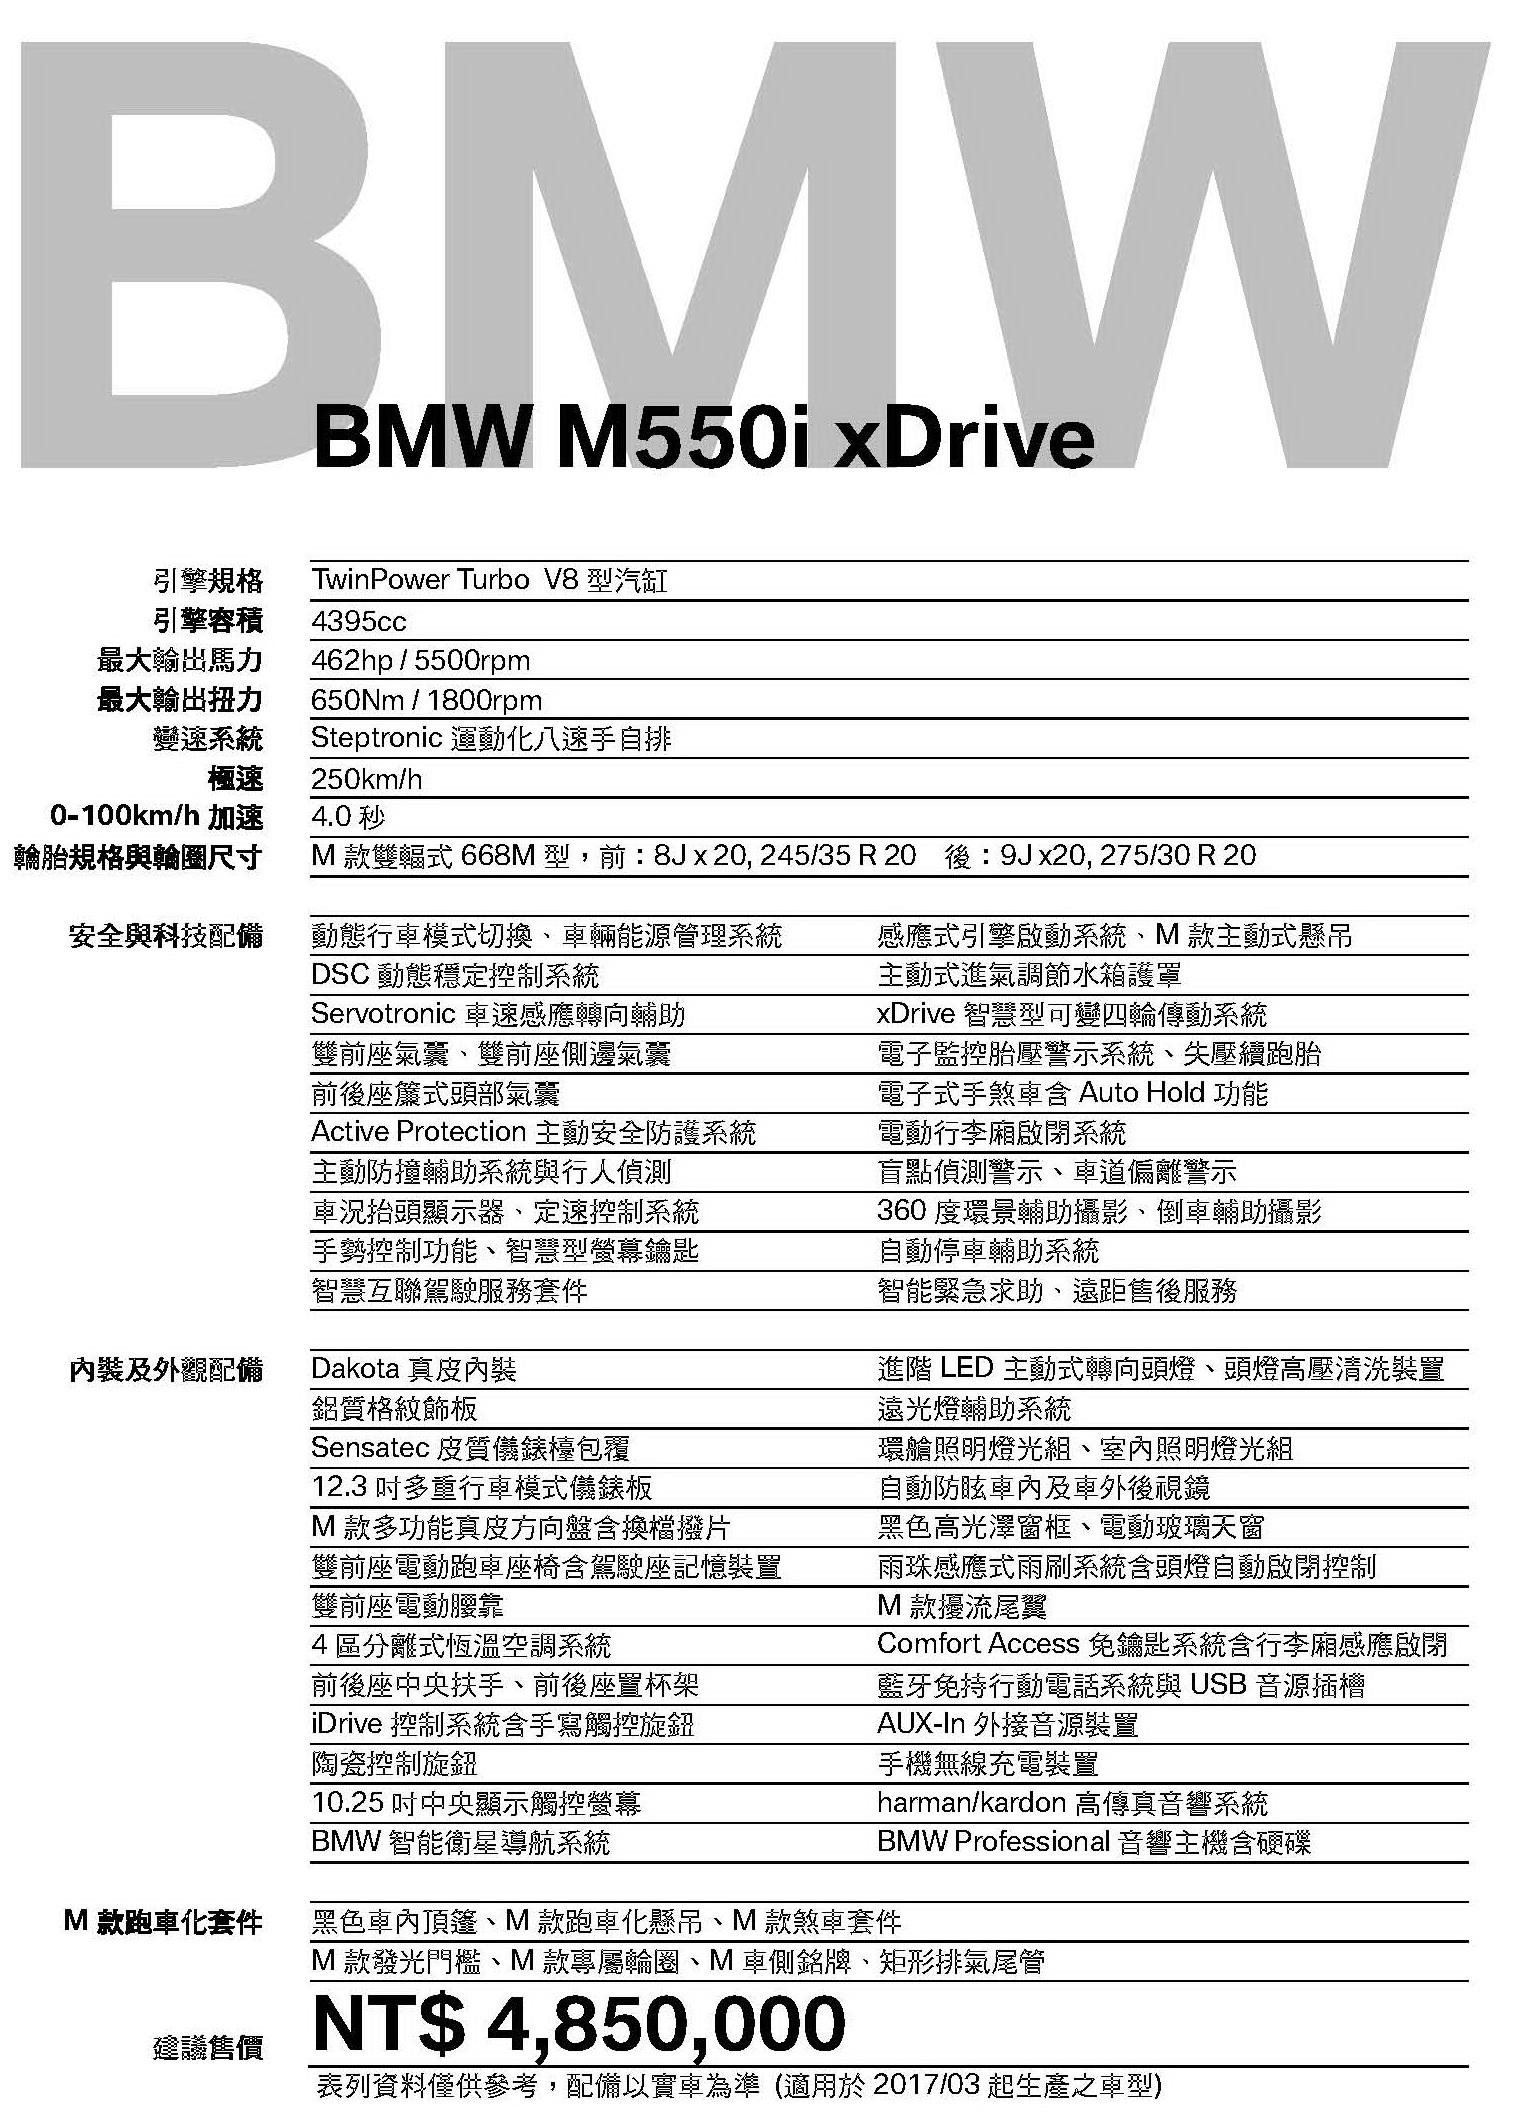 車展表M550i xDrive_2017-03__485